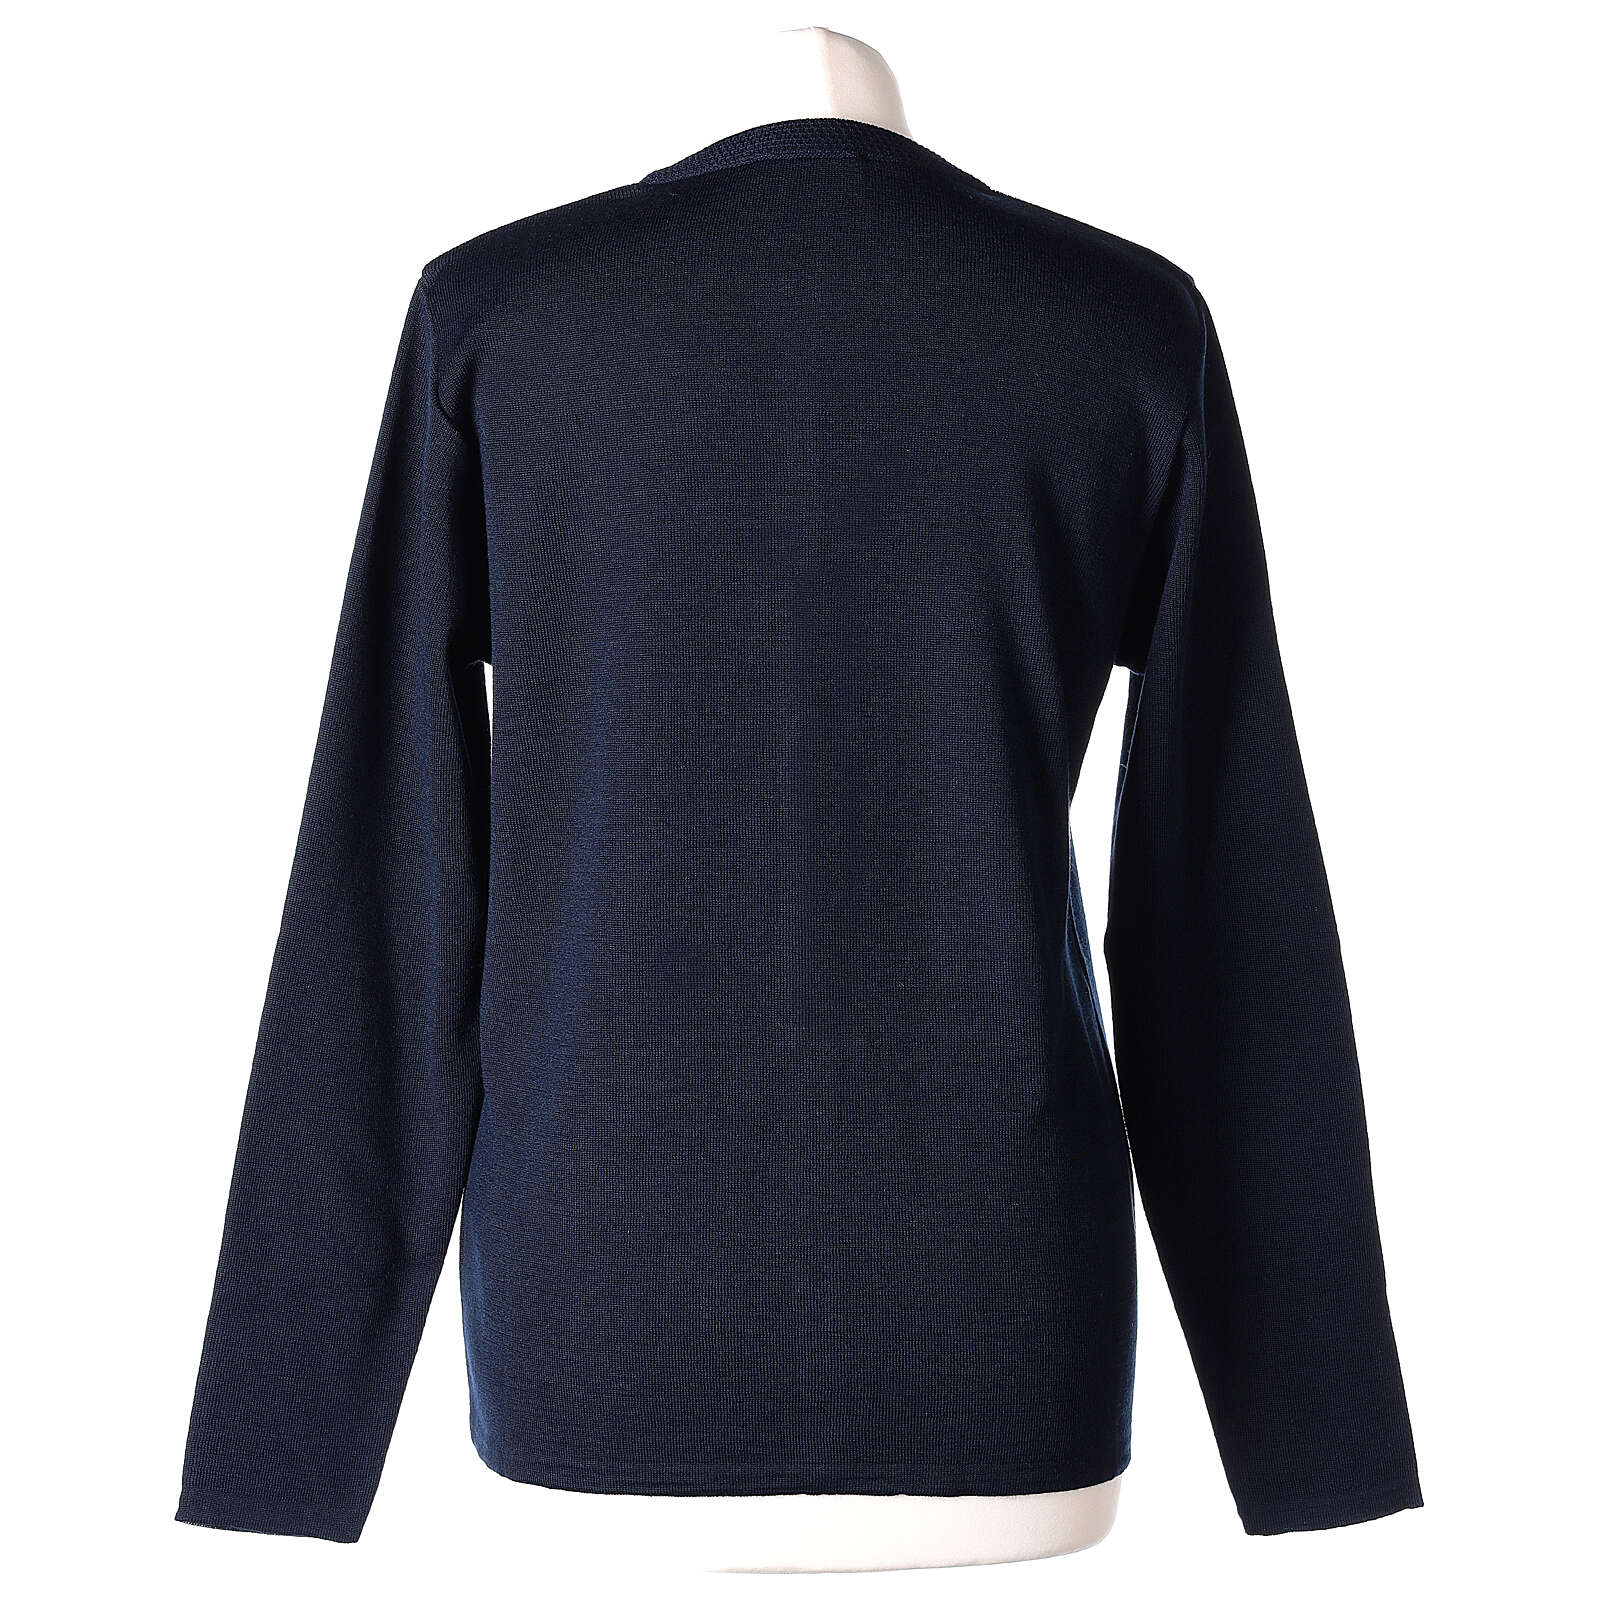 Rebeca monja azul coreana bolsillos punto unido 50% acrílico 50% lana merina In Primis 4